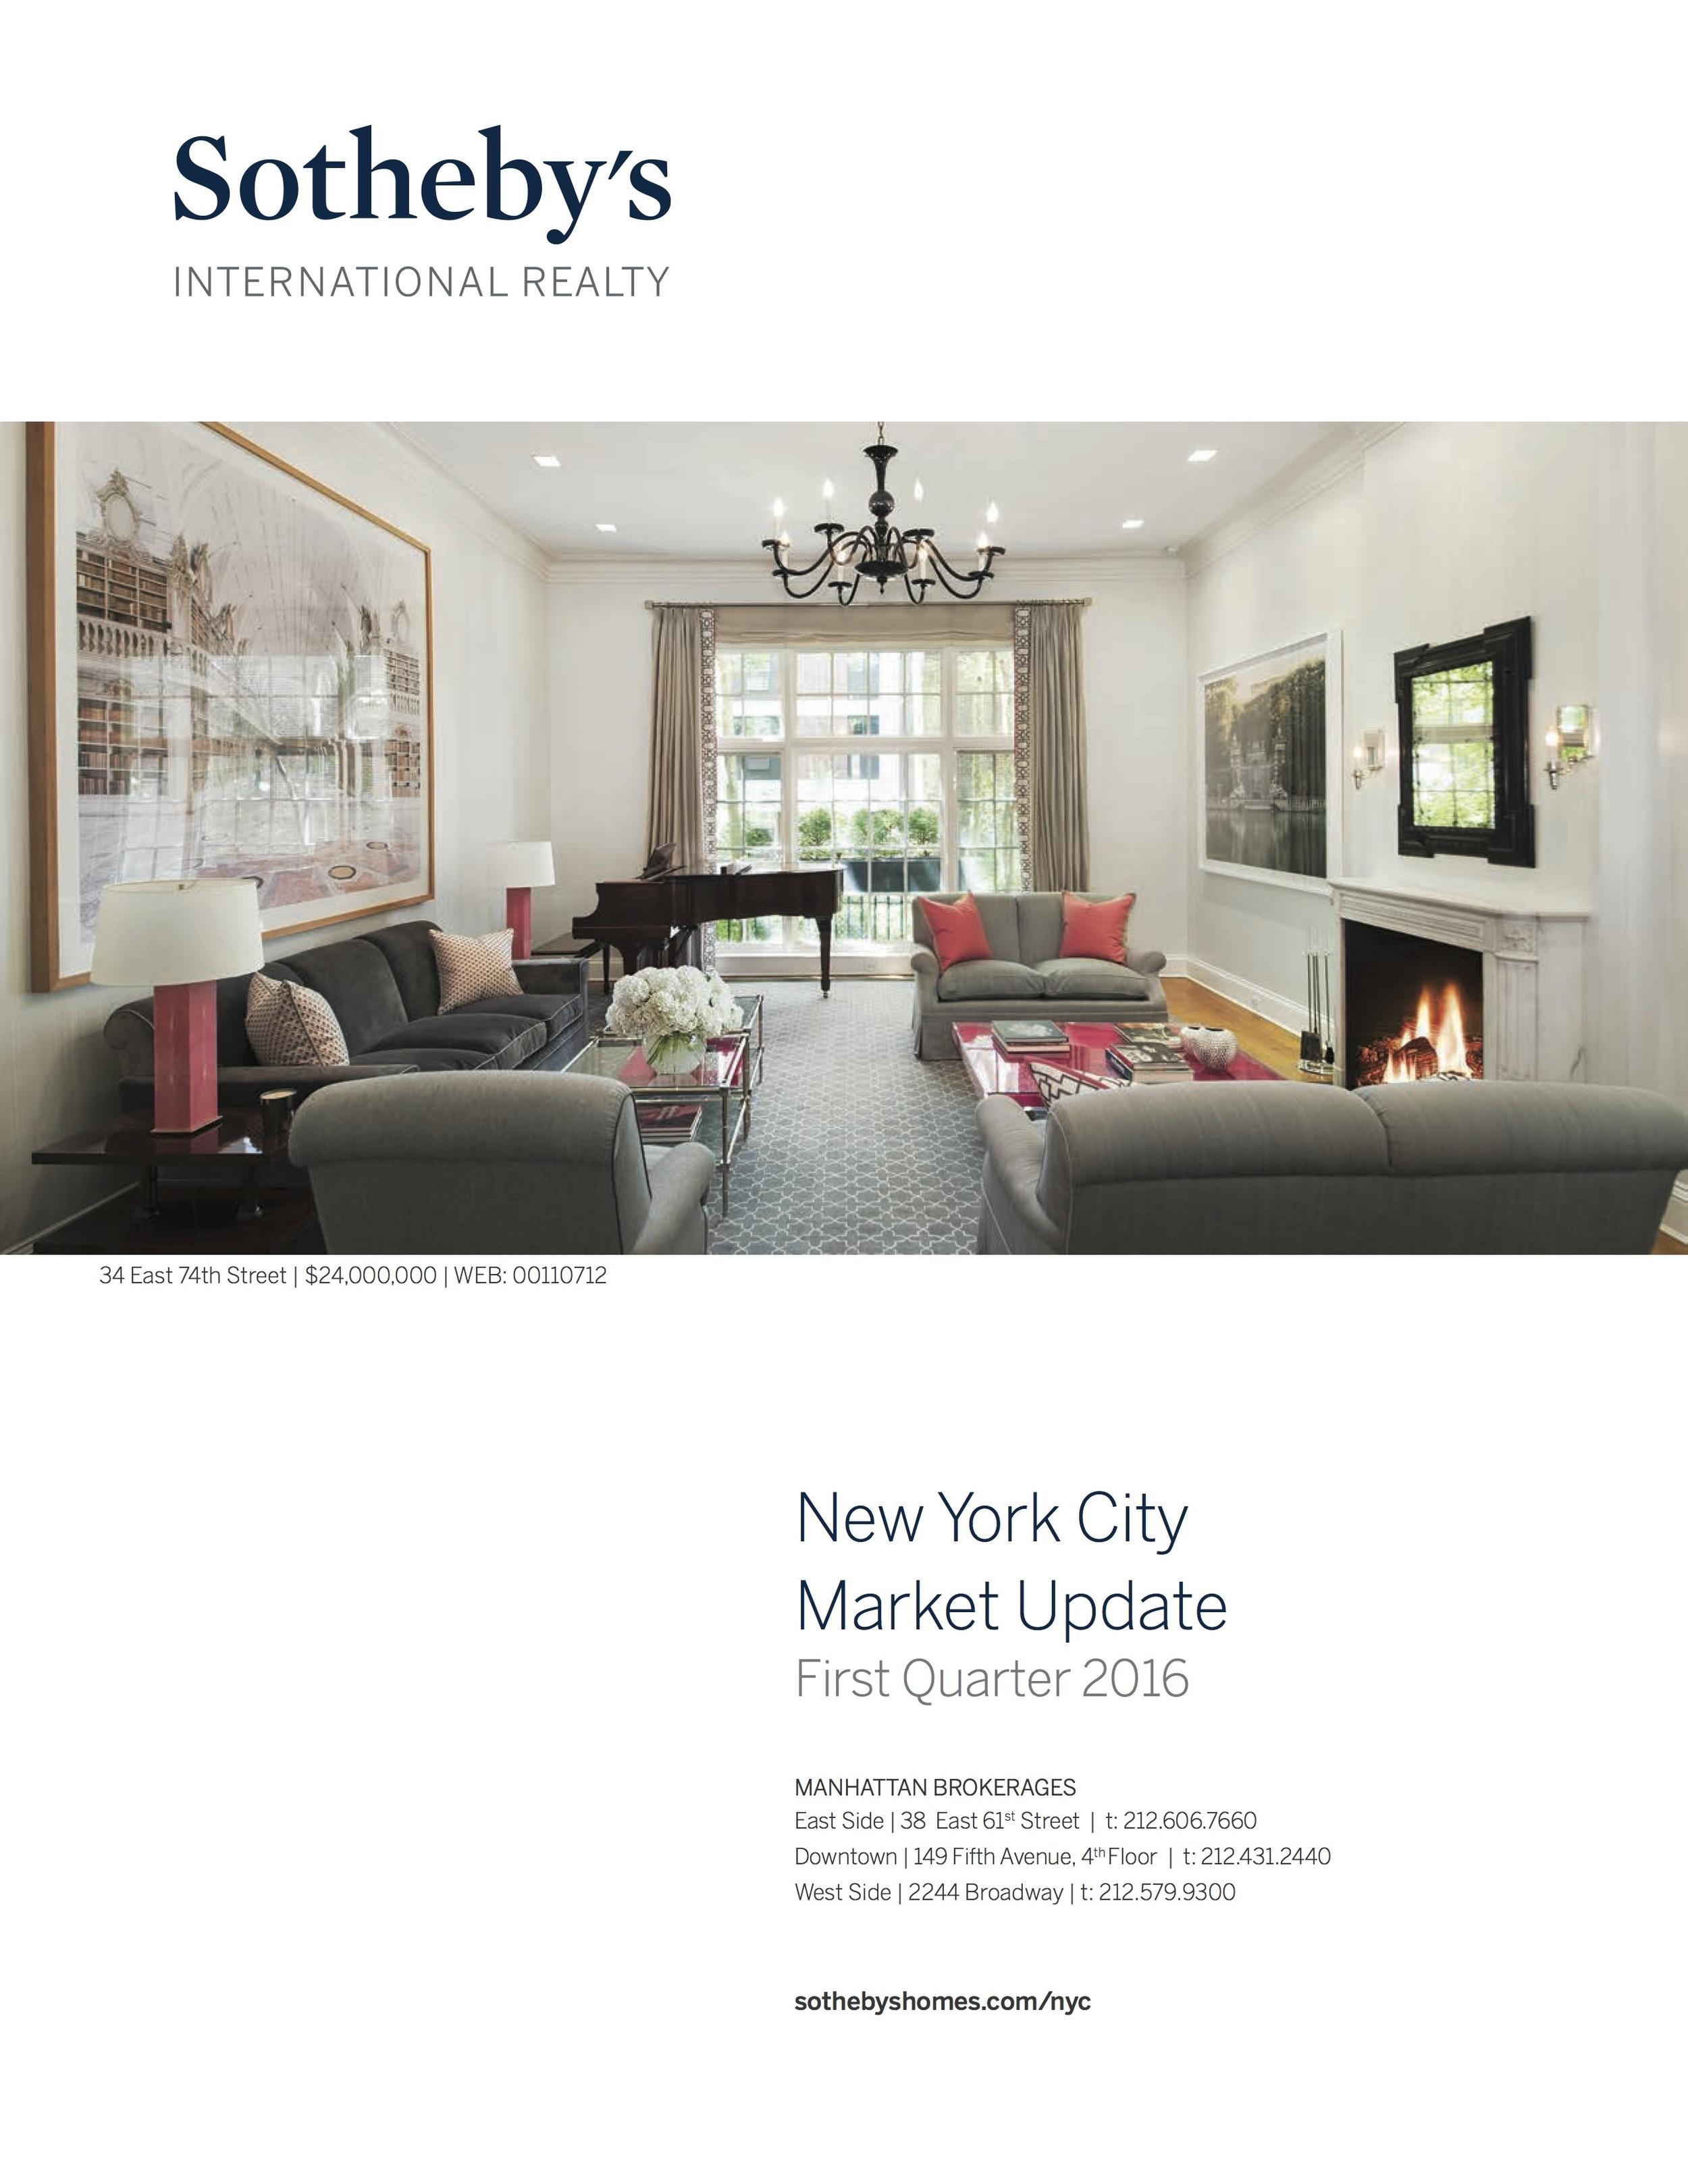 SothebysInternationalRealty_Manhattan_MarketReport_2016_Q1_1.jpg